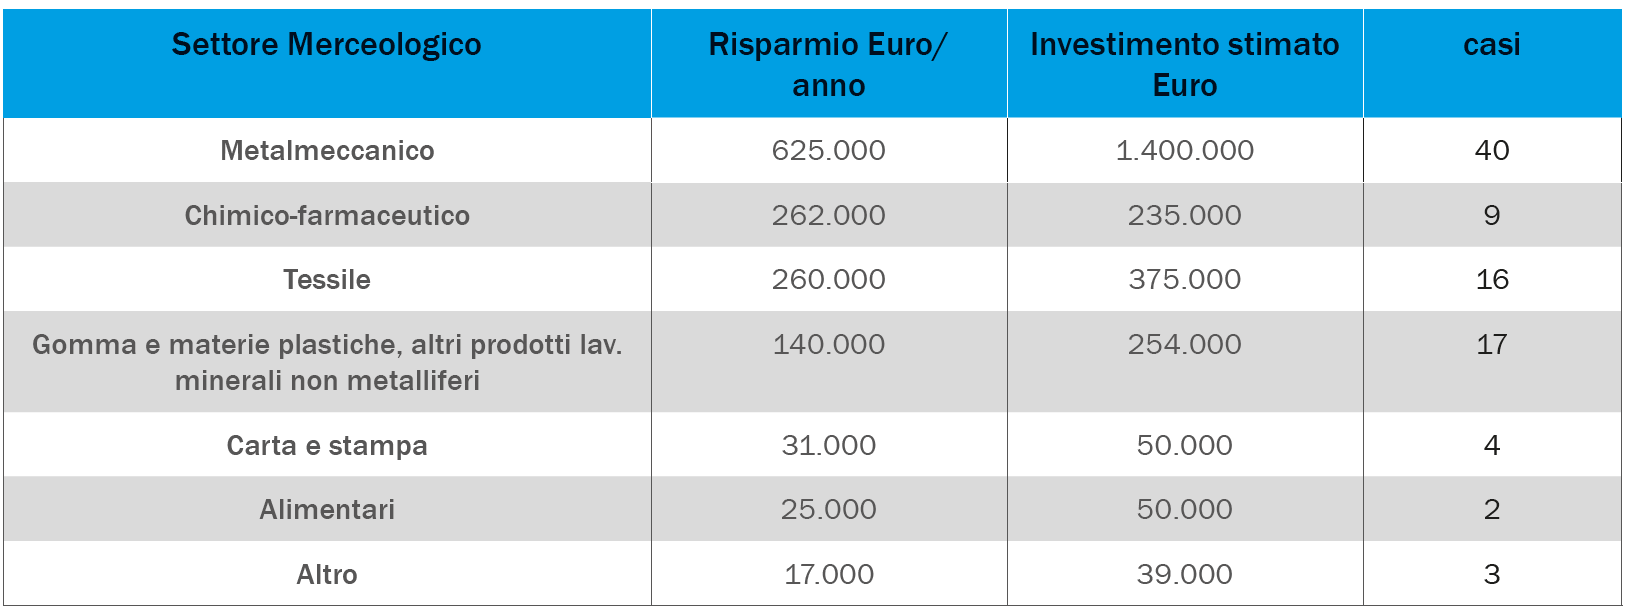 Inverter - risparmio economico potenziale